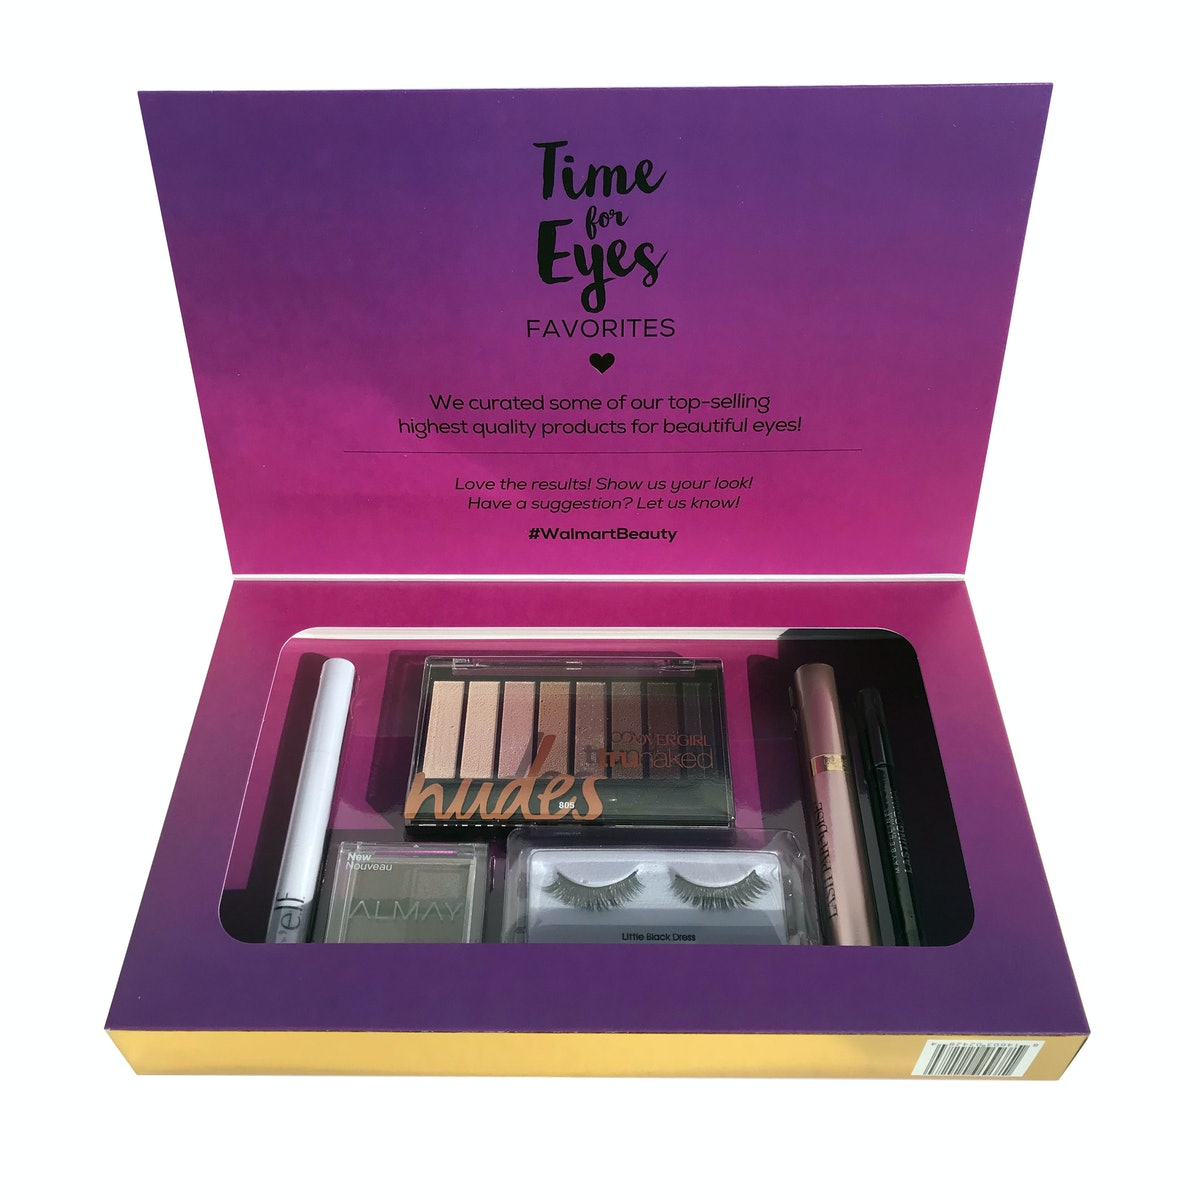 Walmart Beauty Favorites Box: Time For Eyes